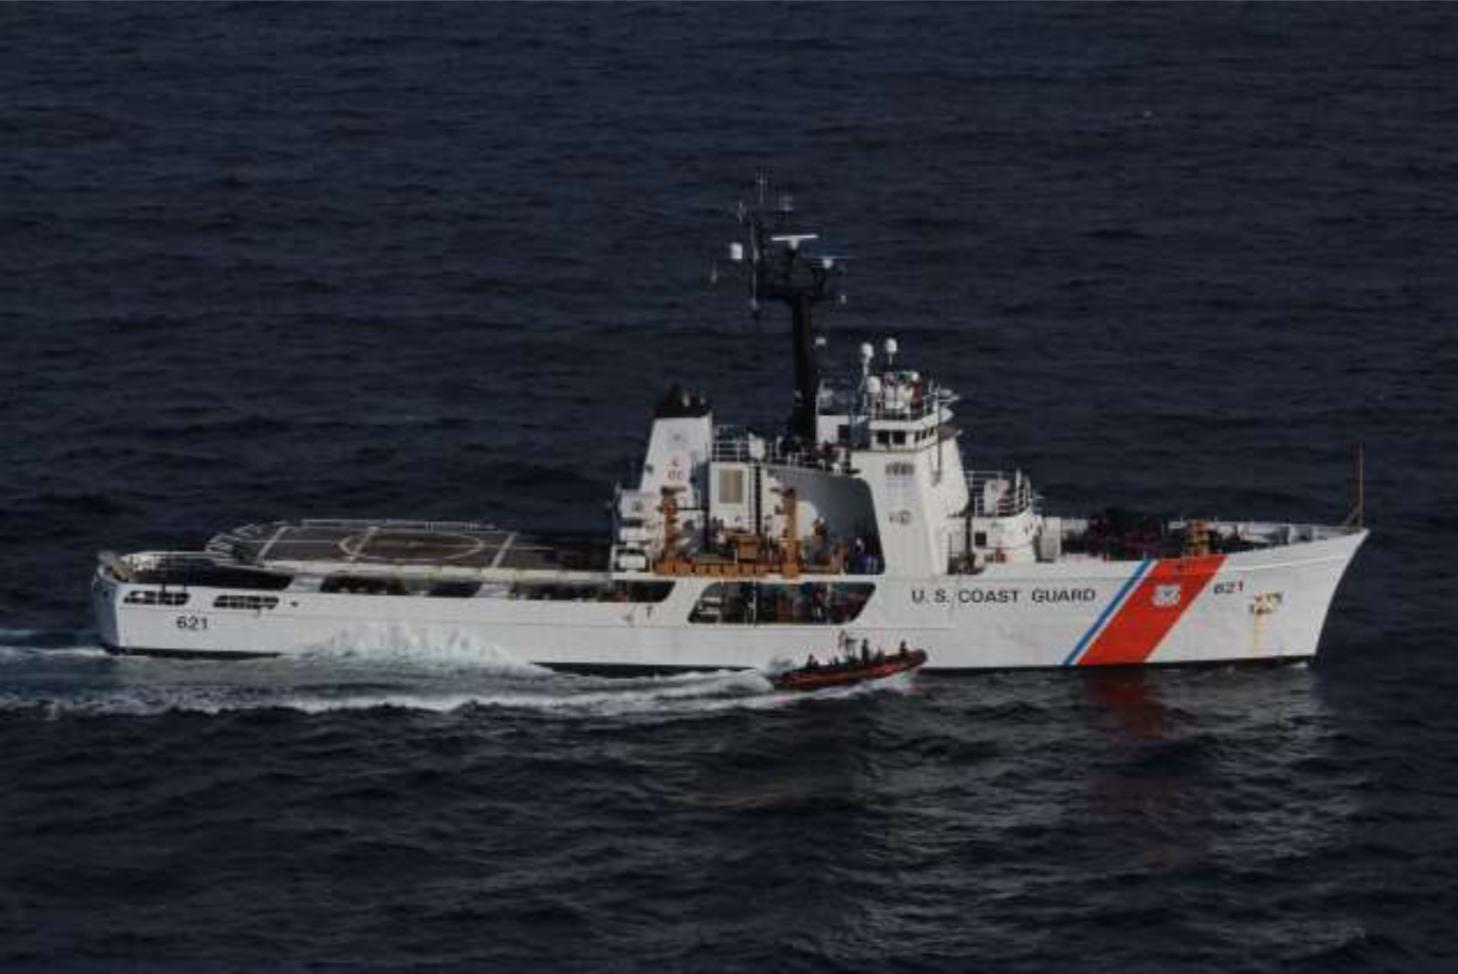 PHOTO RELEASE: Coast Guard Cutter Valiant crew returns home following 9-week counter-drug patrol